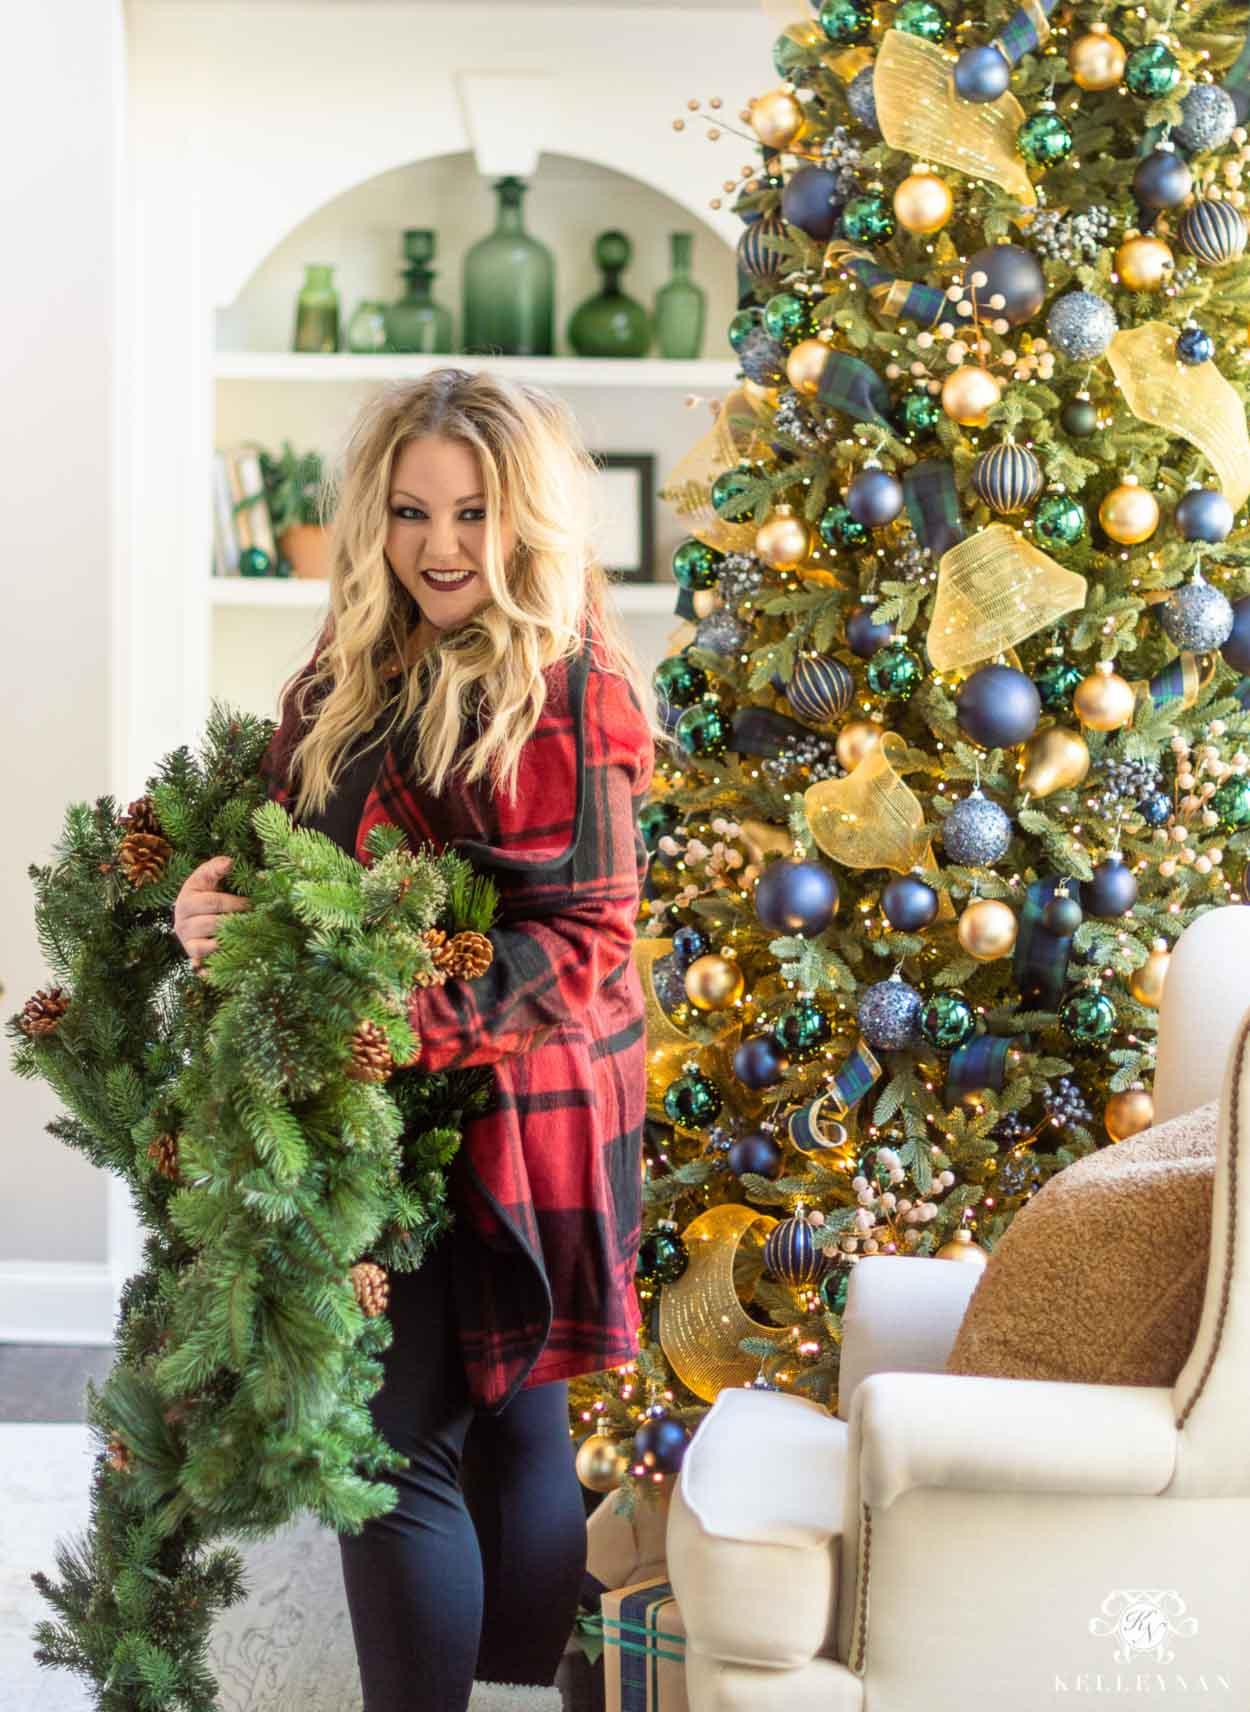 Christmas Mantel Garland From Basic To Beautiful Kelley Nan